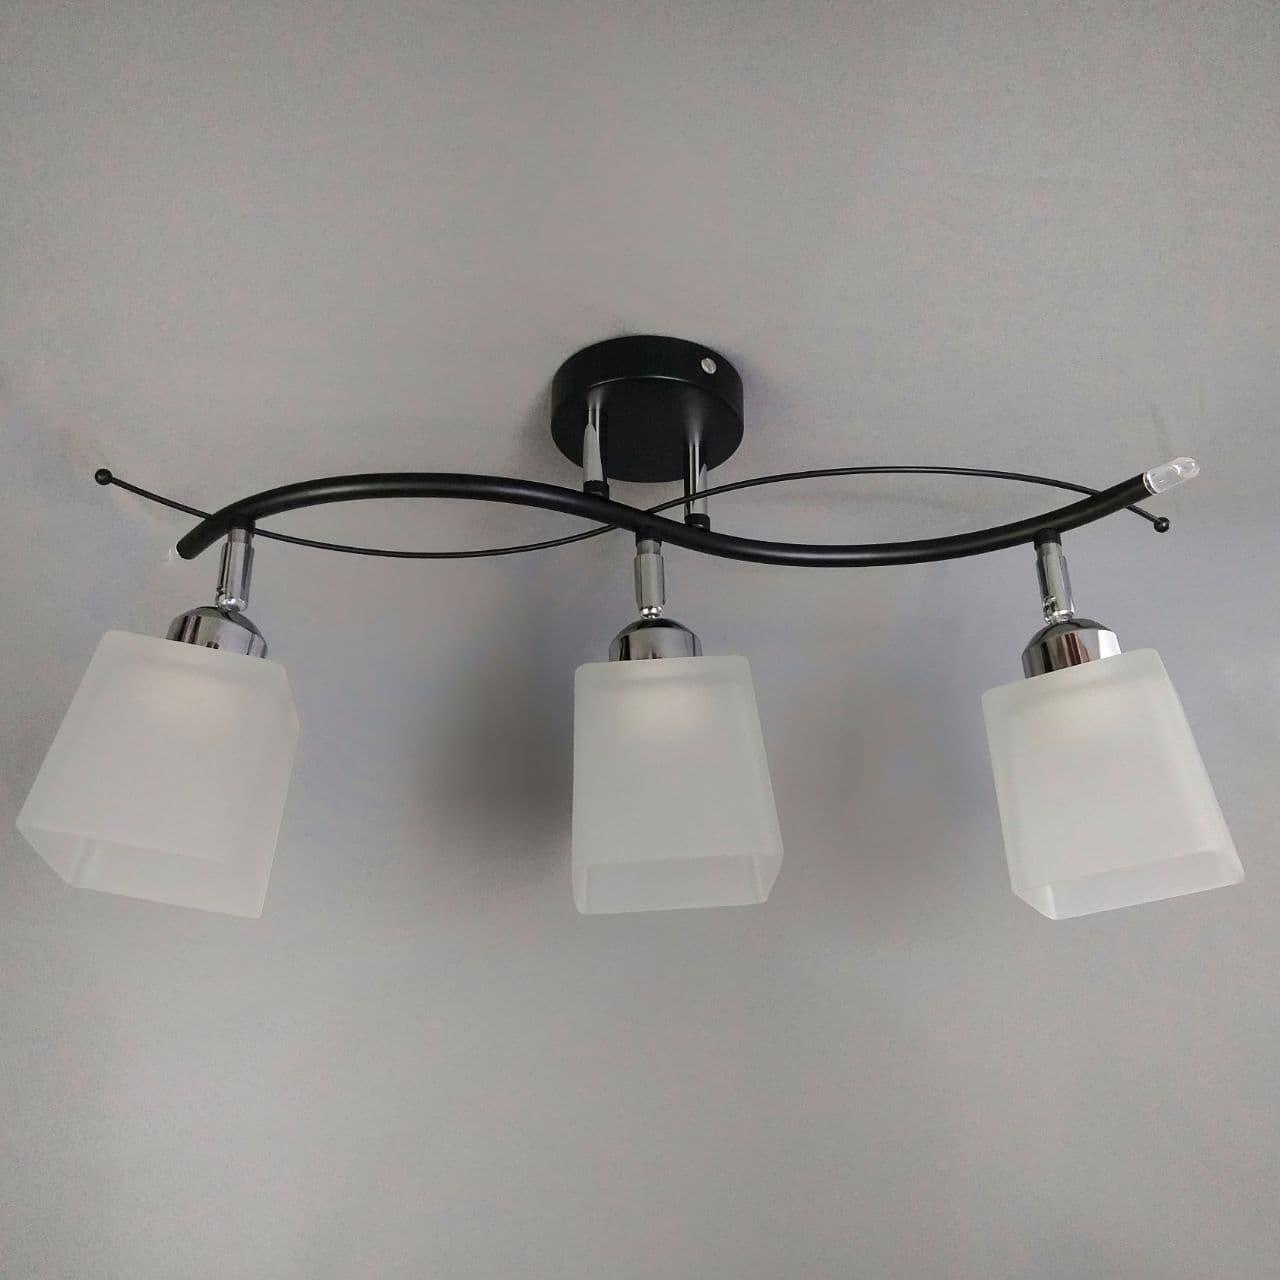 Люстра потолочная на 3 поворотных плафона черная с хромом 70-8855/3 CR+BK+WT